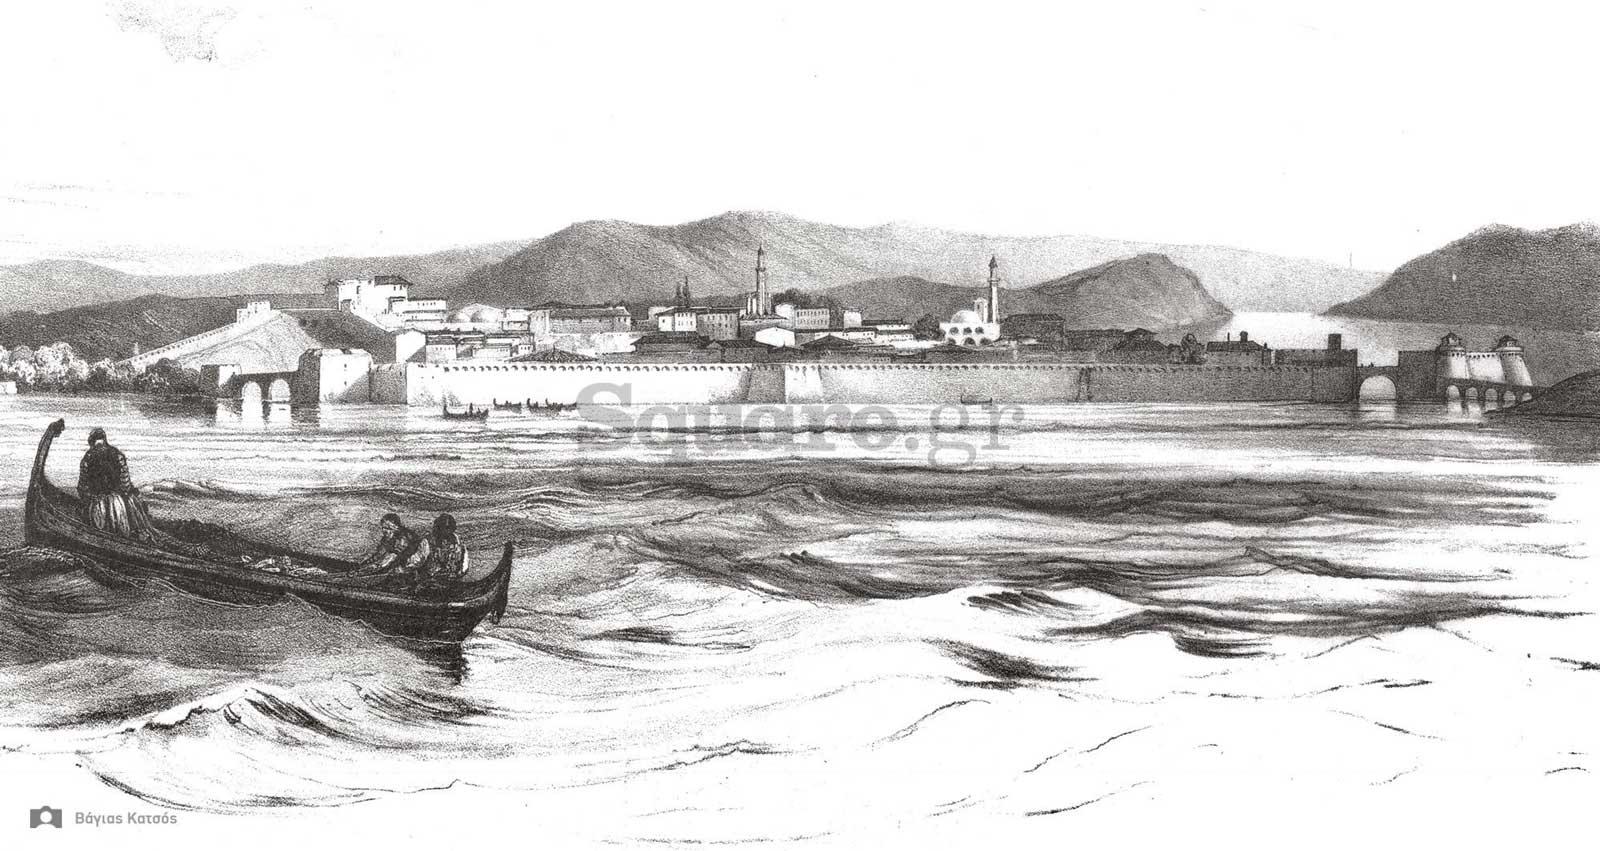 1-Otto-Magnus-von-Stackelberg-La-Grece-Vues-pittoresques-et-topographiques-1829-1834